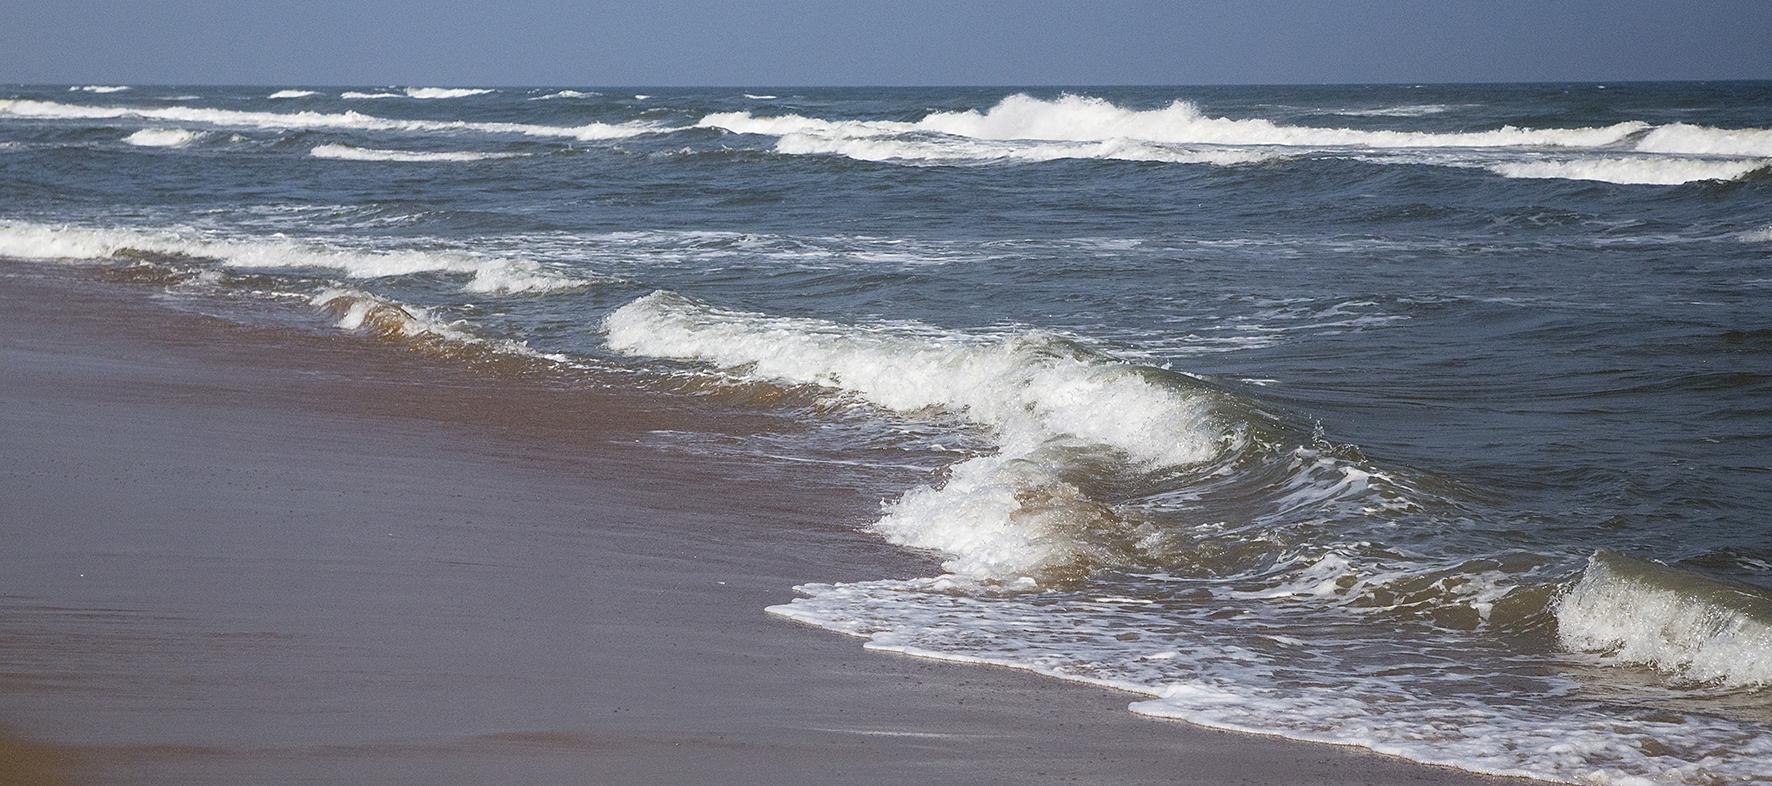 voyages-inde-sud-bord-eau-2014-marie-colette-becker-01